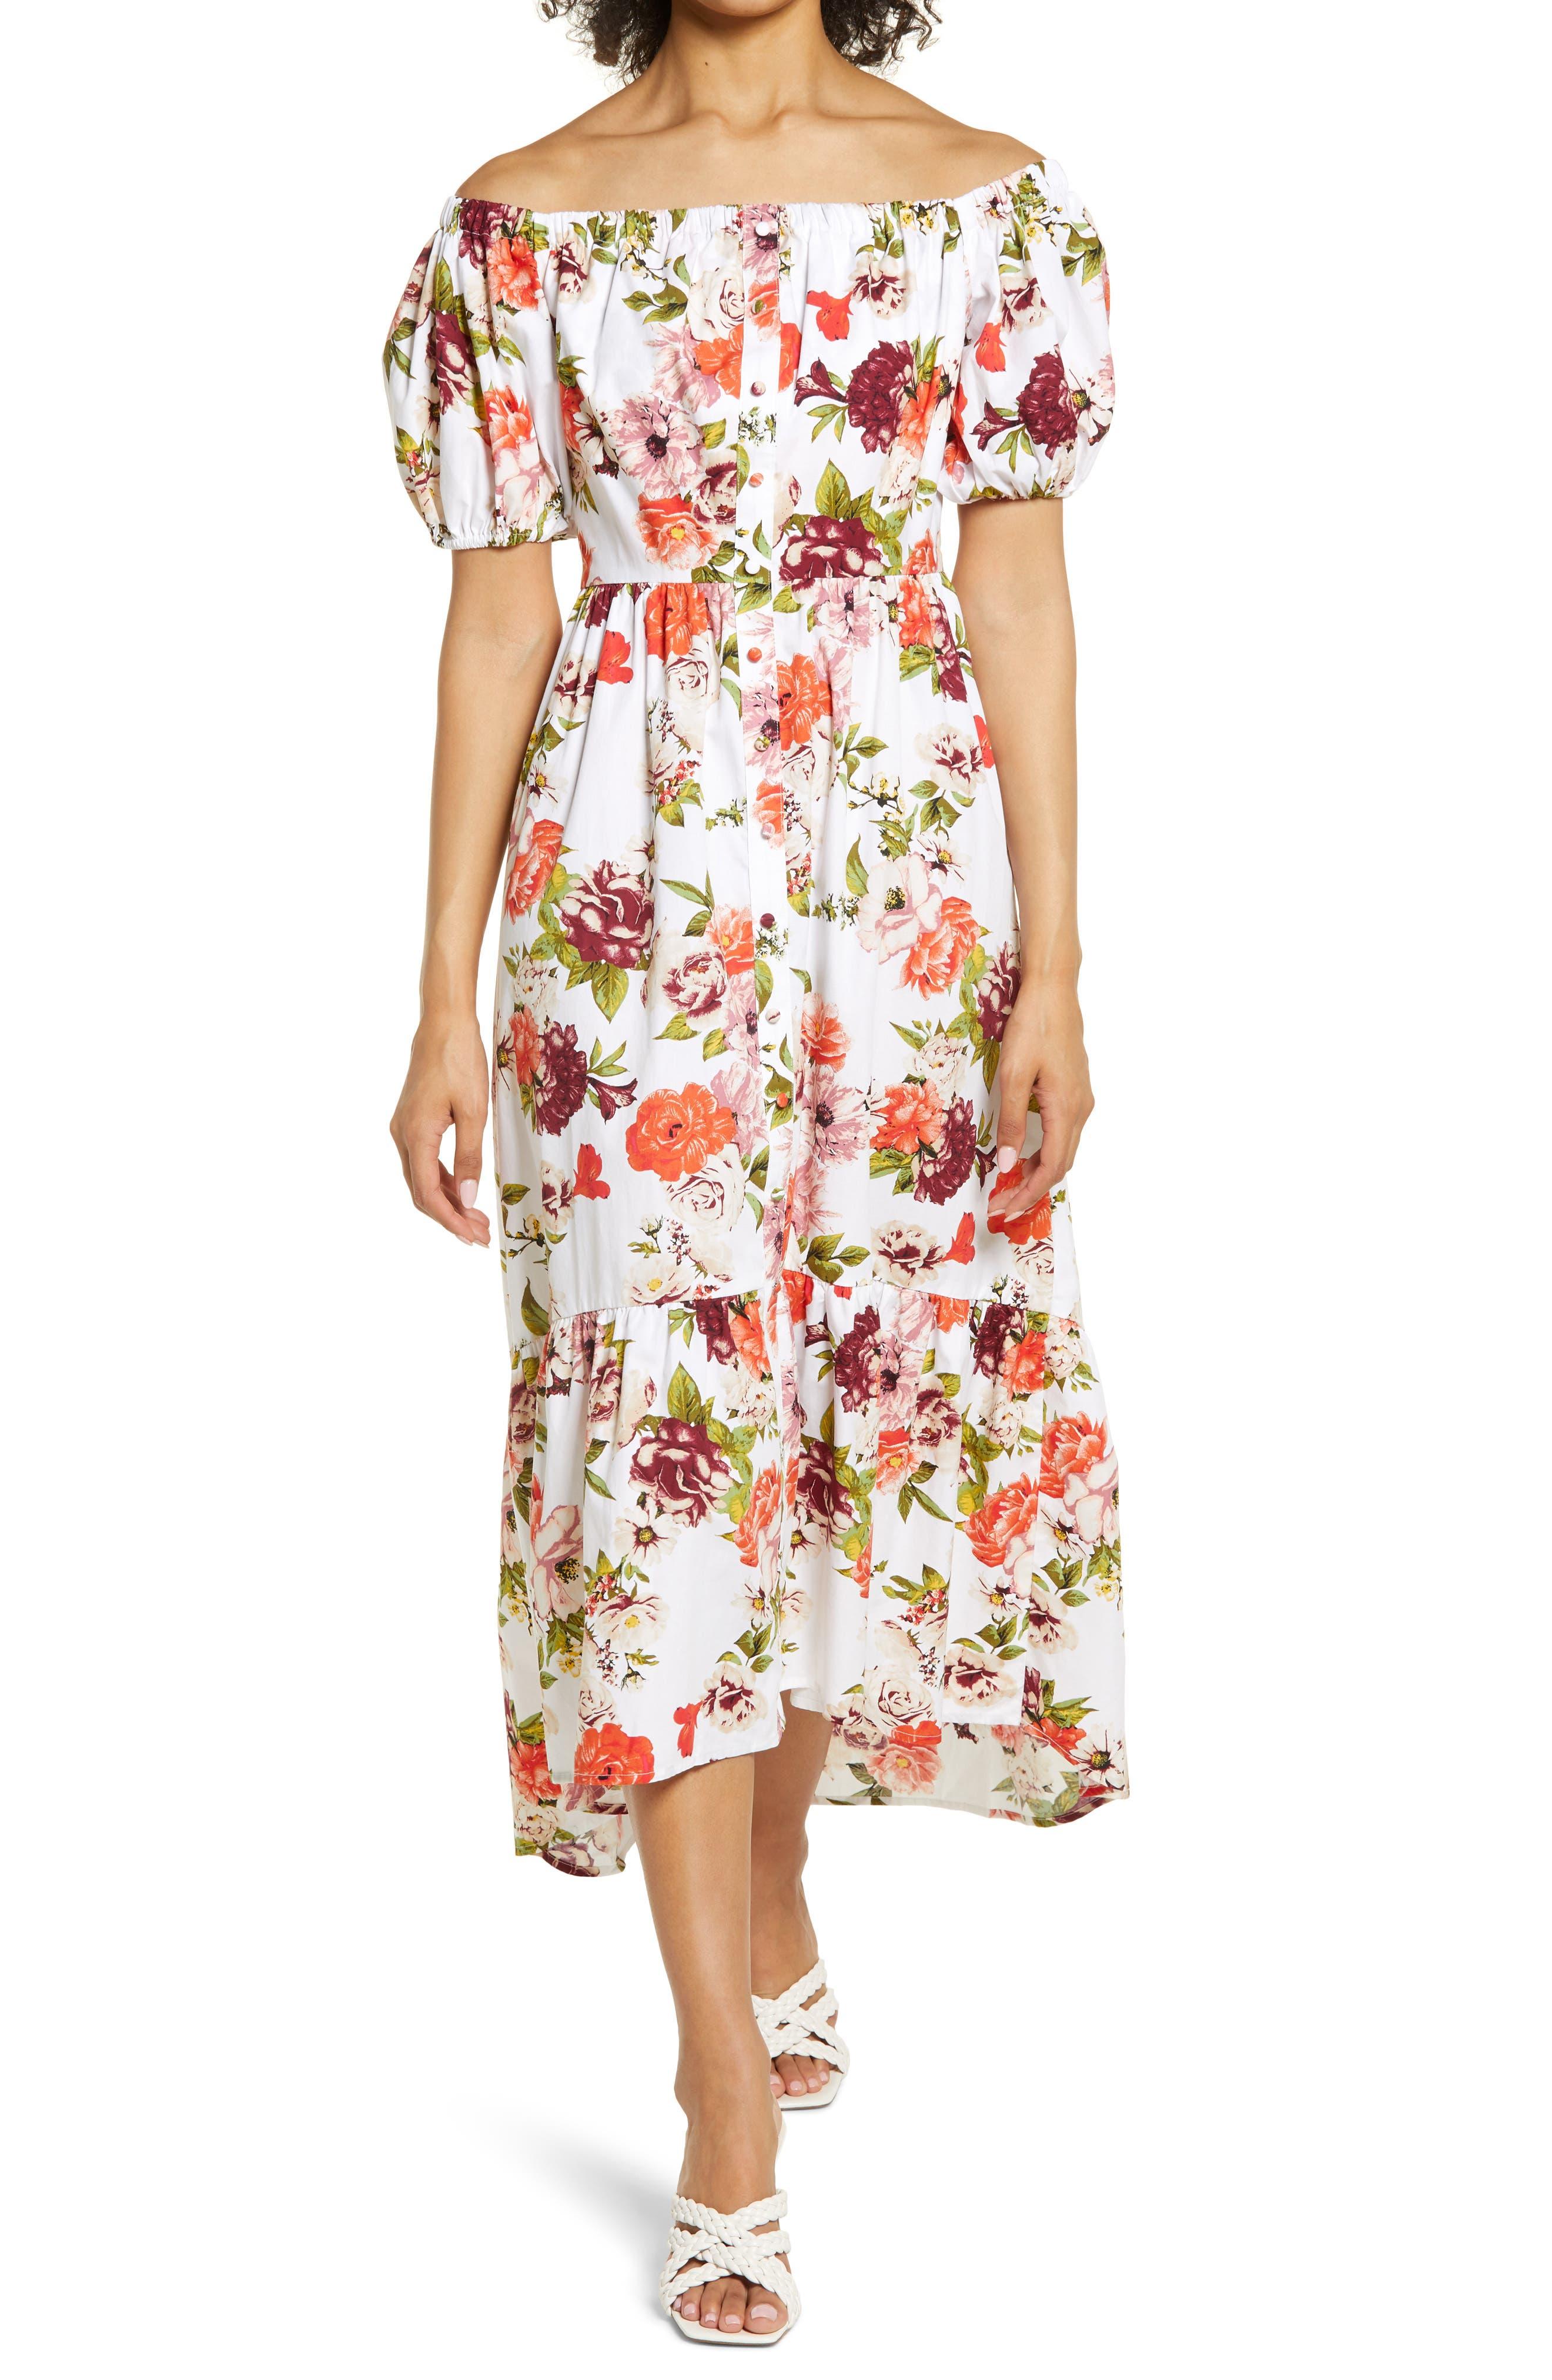 Off The Shoulder Button-Up Dress